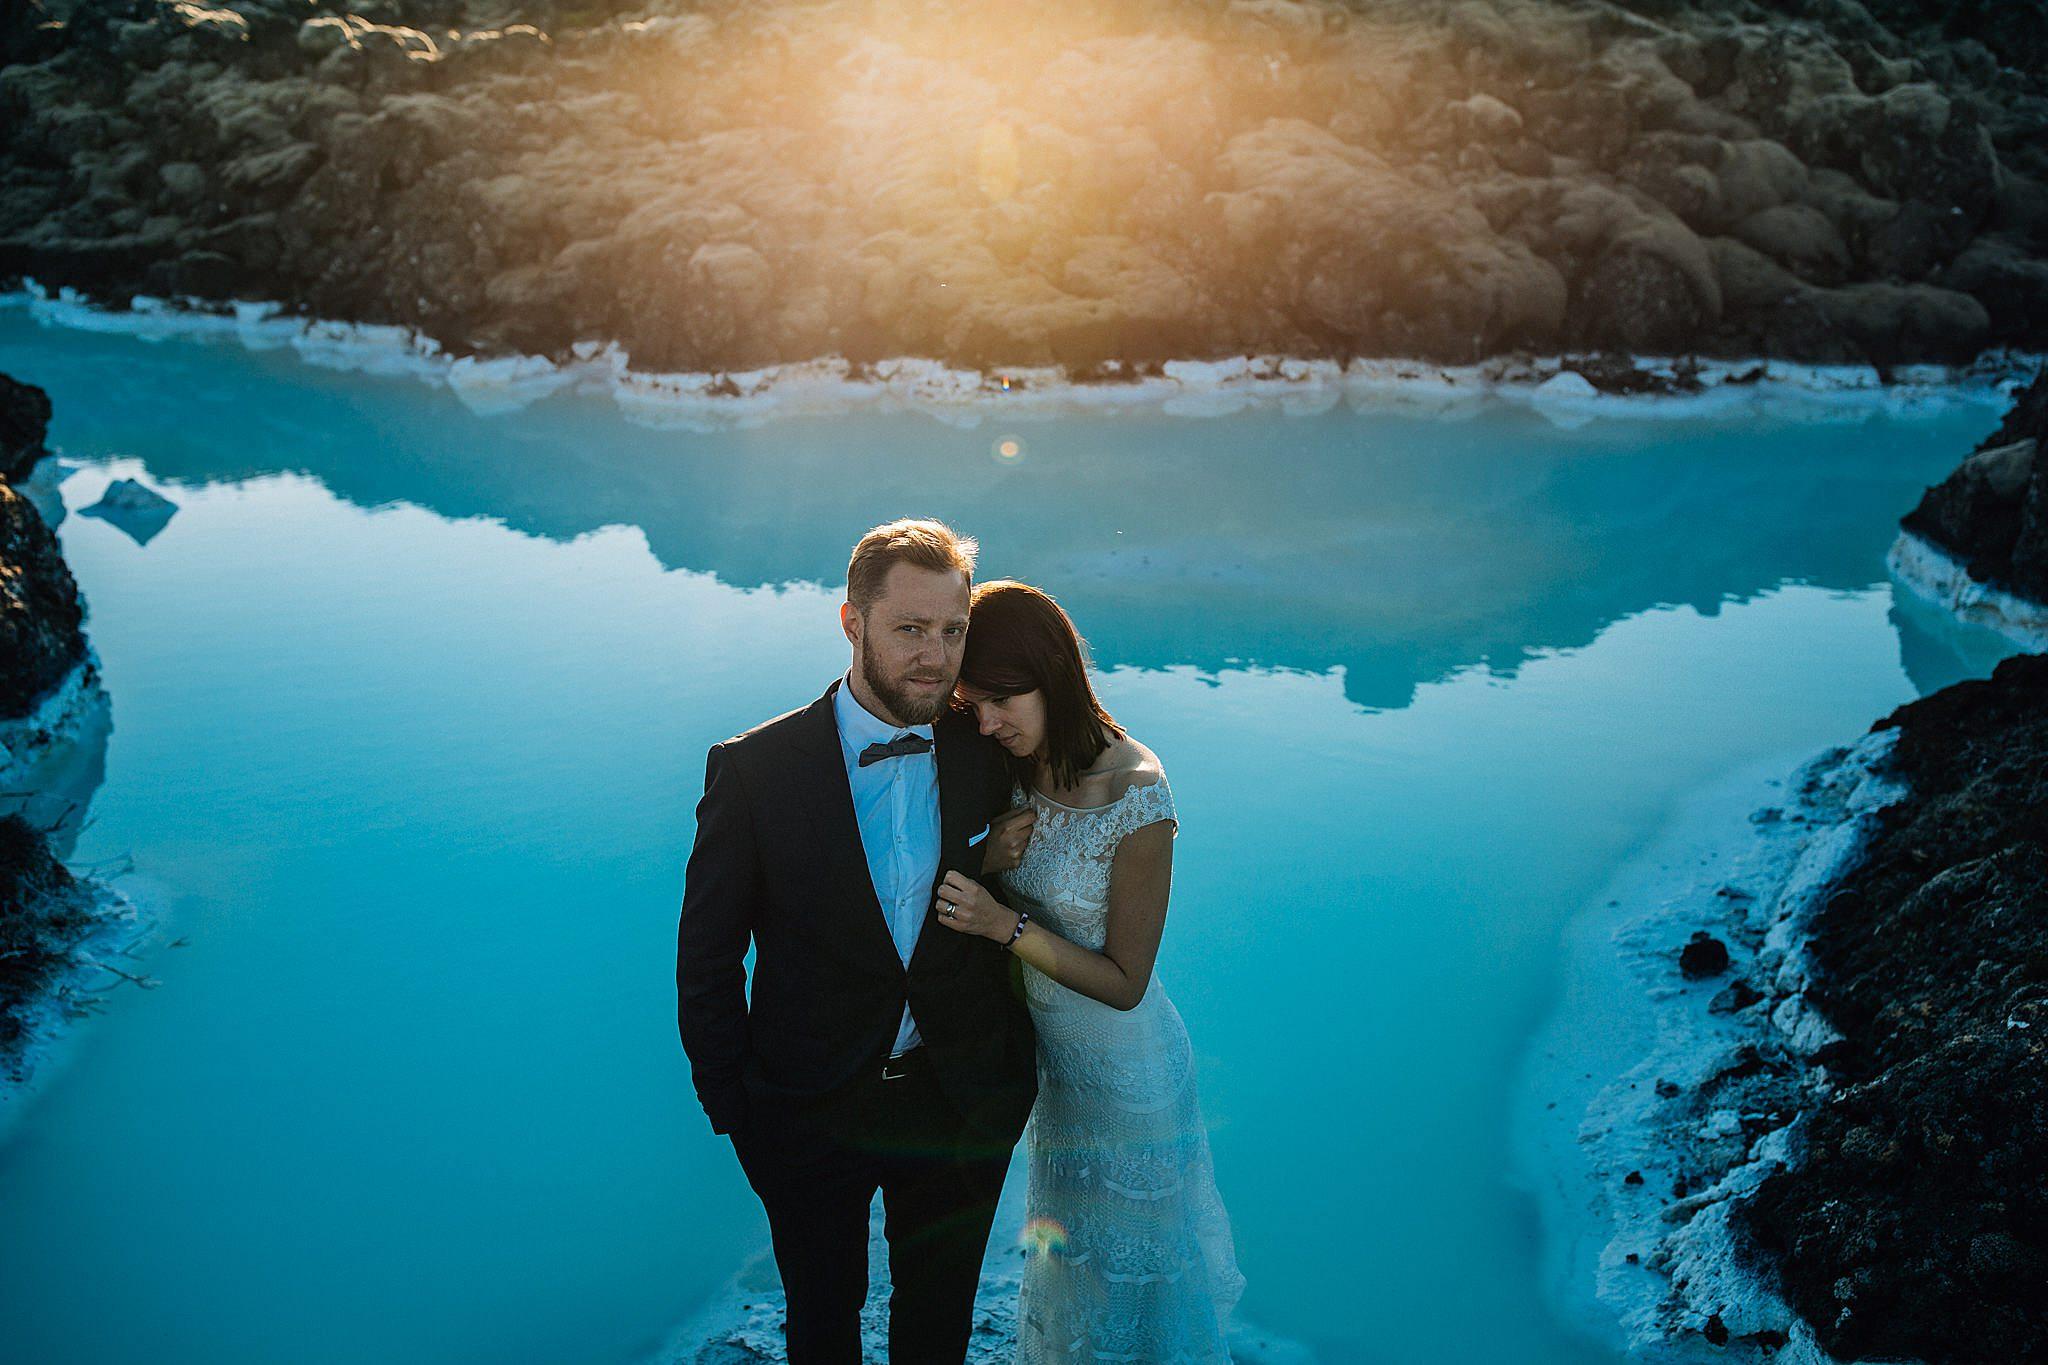 Blue lagoon sesja pary mlodej Islandia